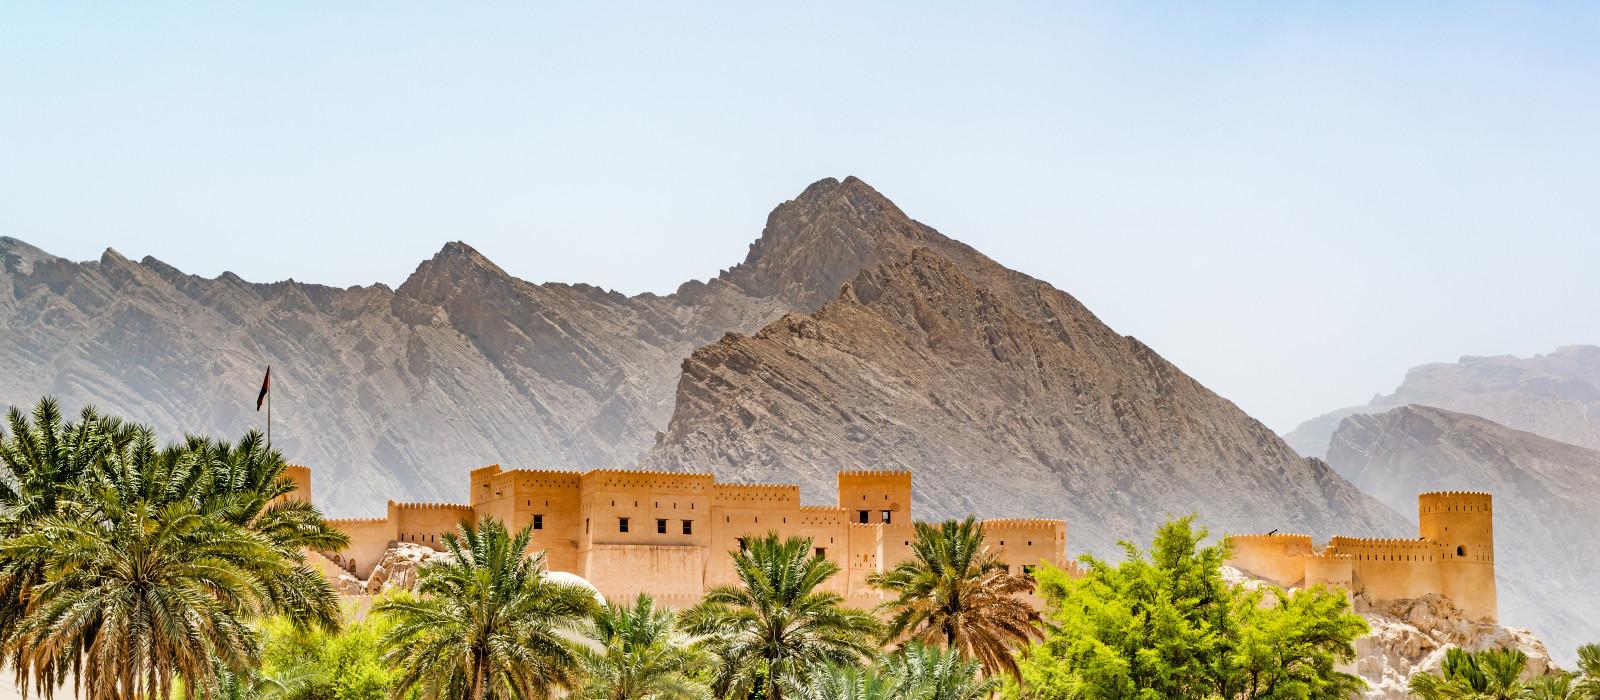 Oman Reisen: Nakhal-Fort in der Region Al Batinah, Oman.